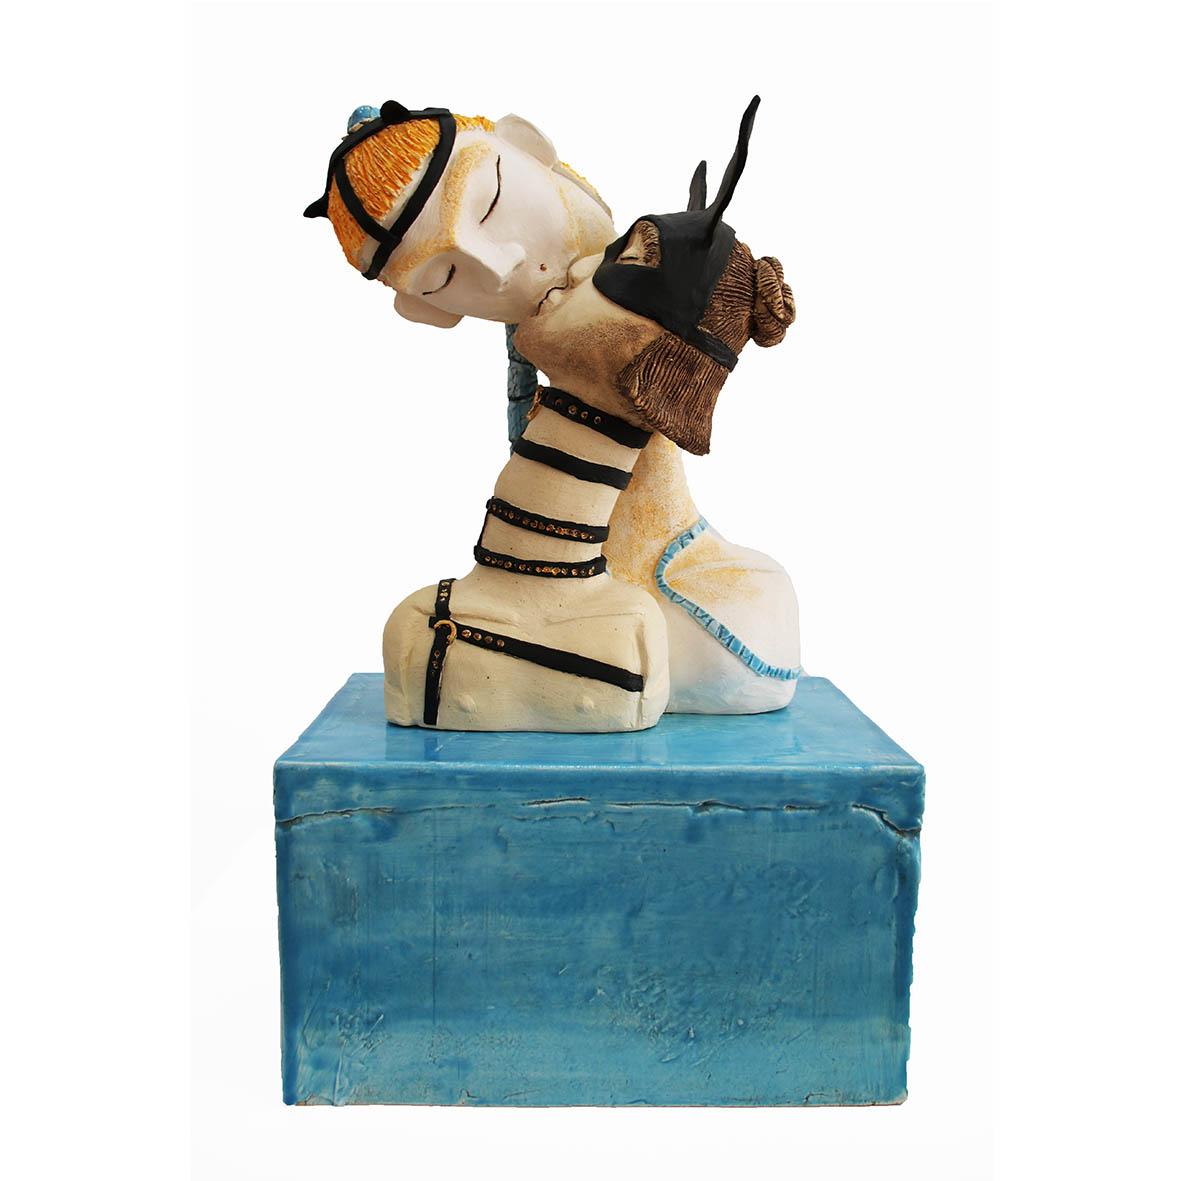 Nava Derakhchani The Ears 2019 Mixed media ceramic sculpture 25 x 17 x 41 cm